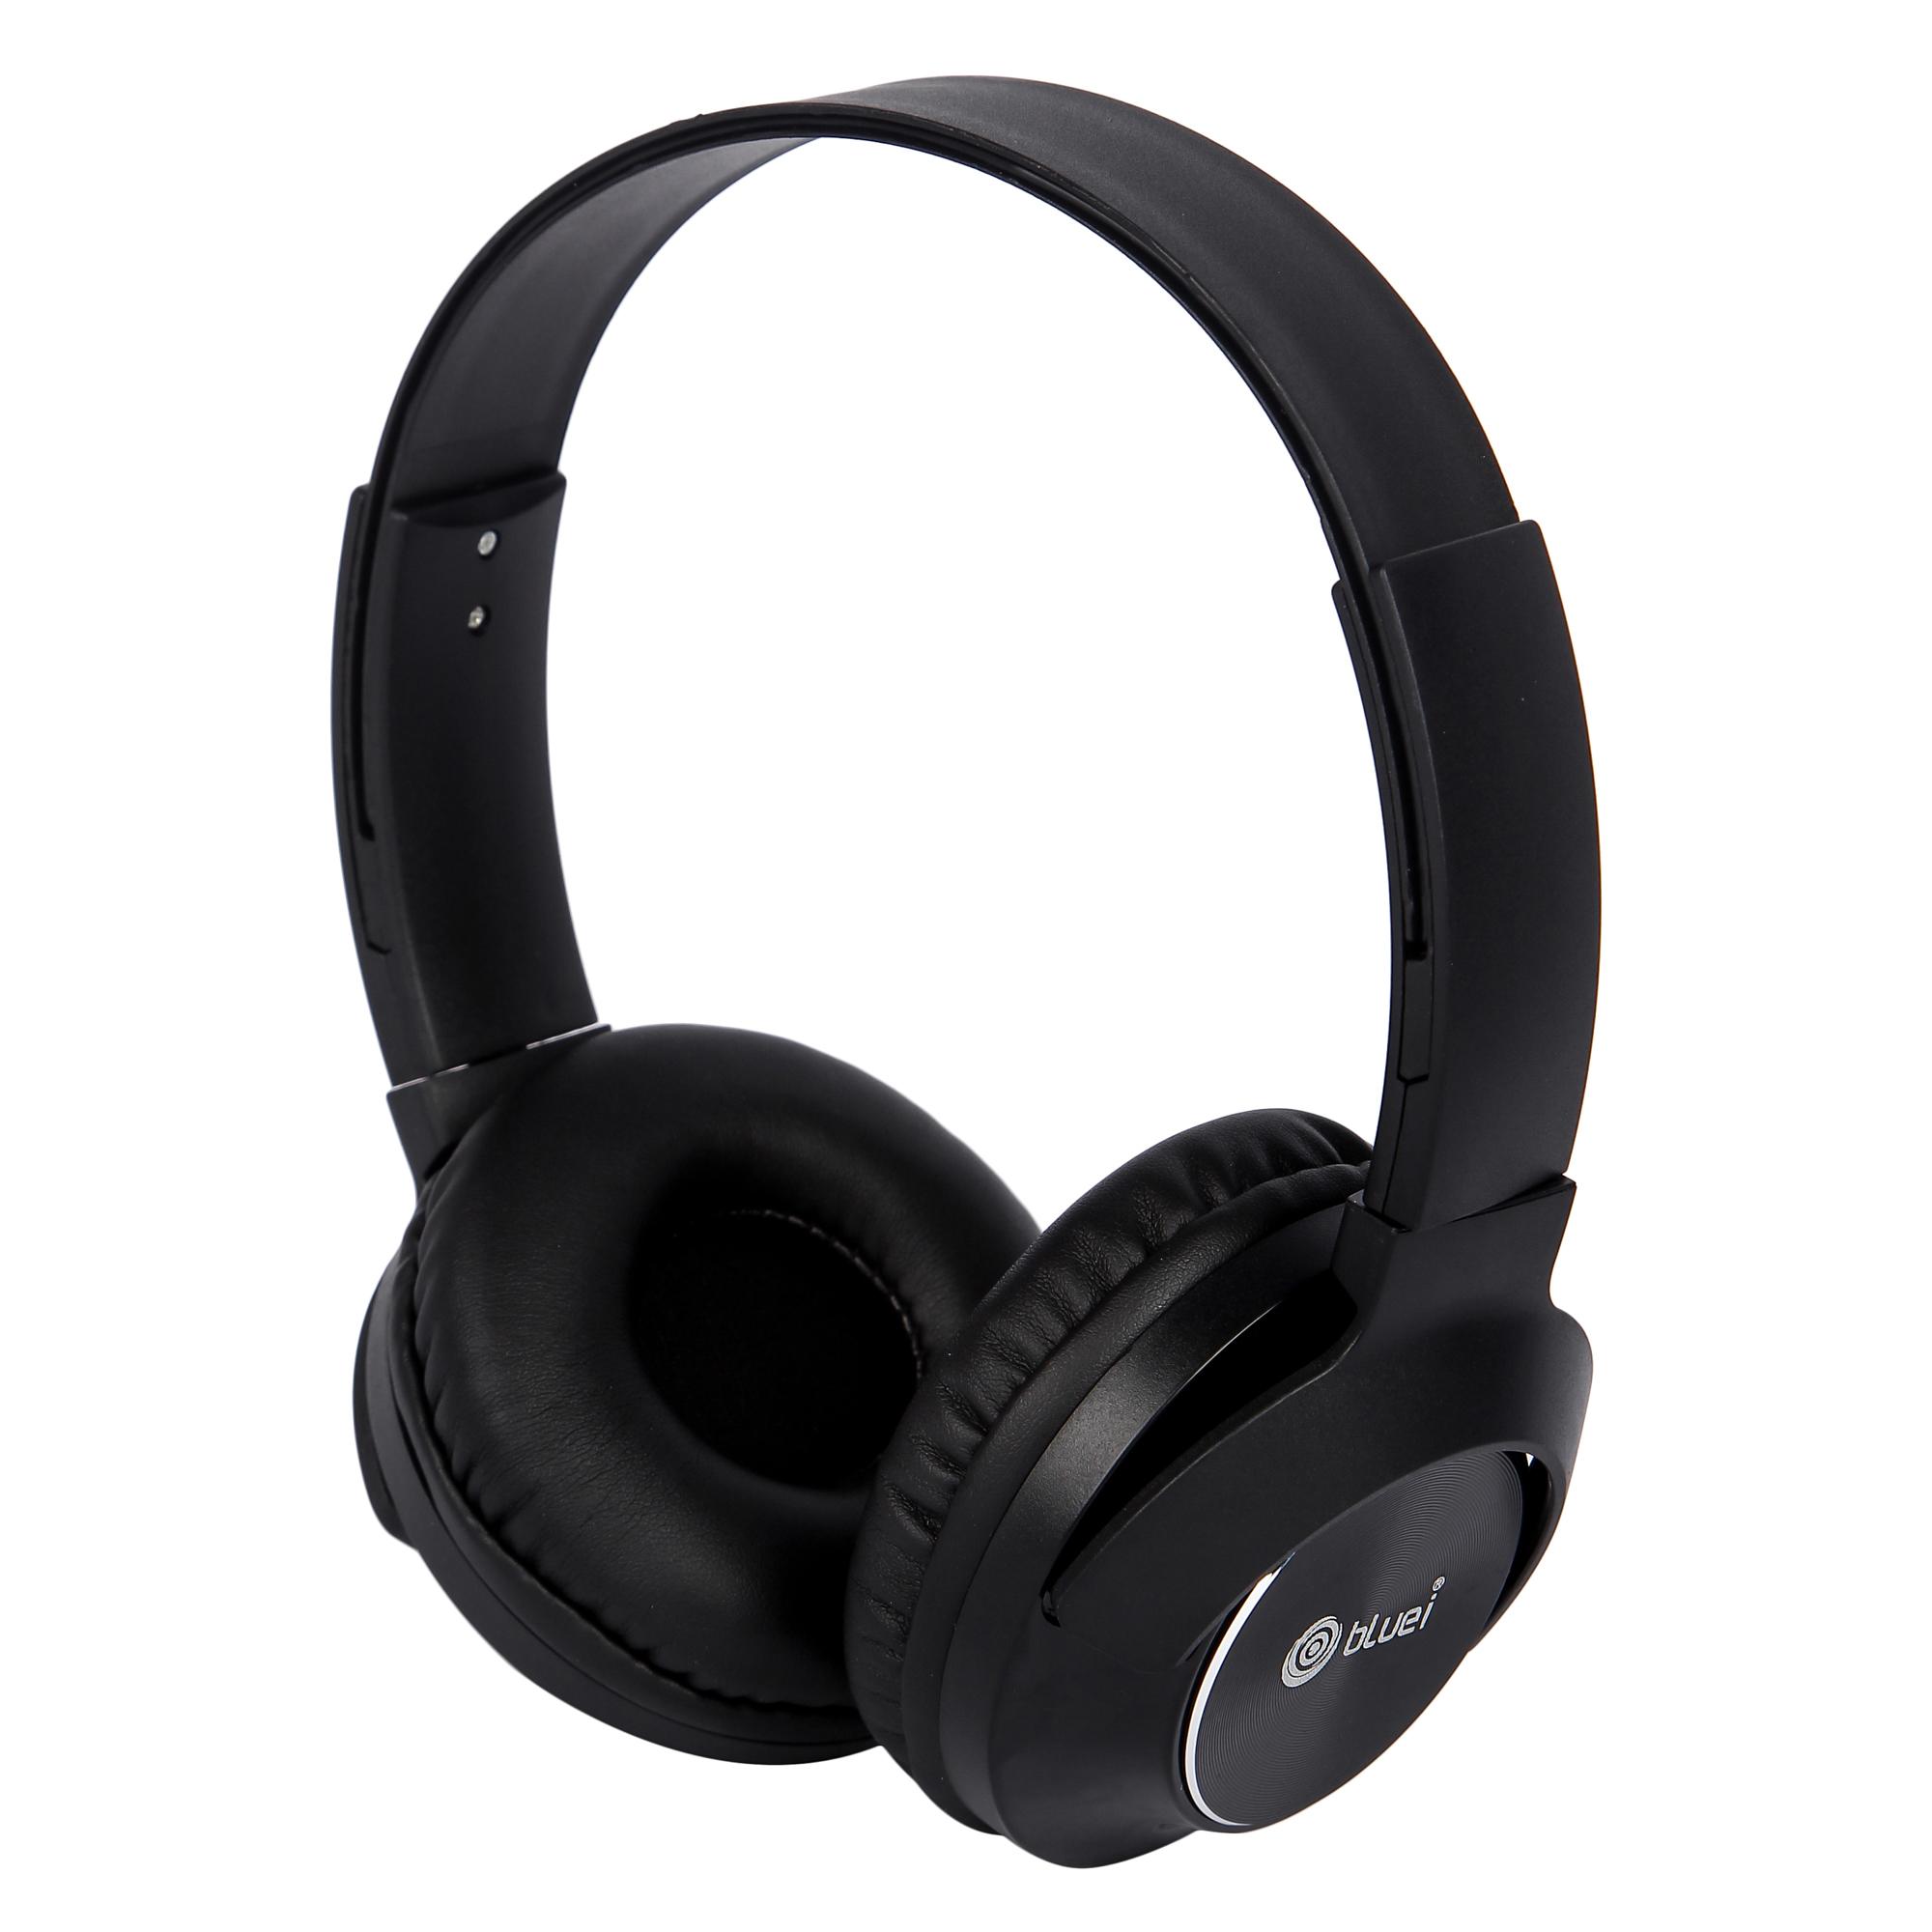 Bluei Massive-2 Wireless Heavy Bass Headphones